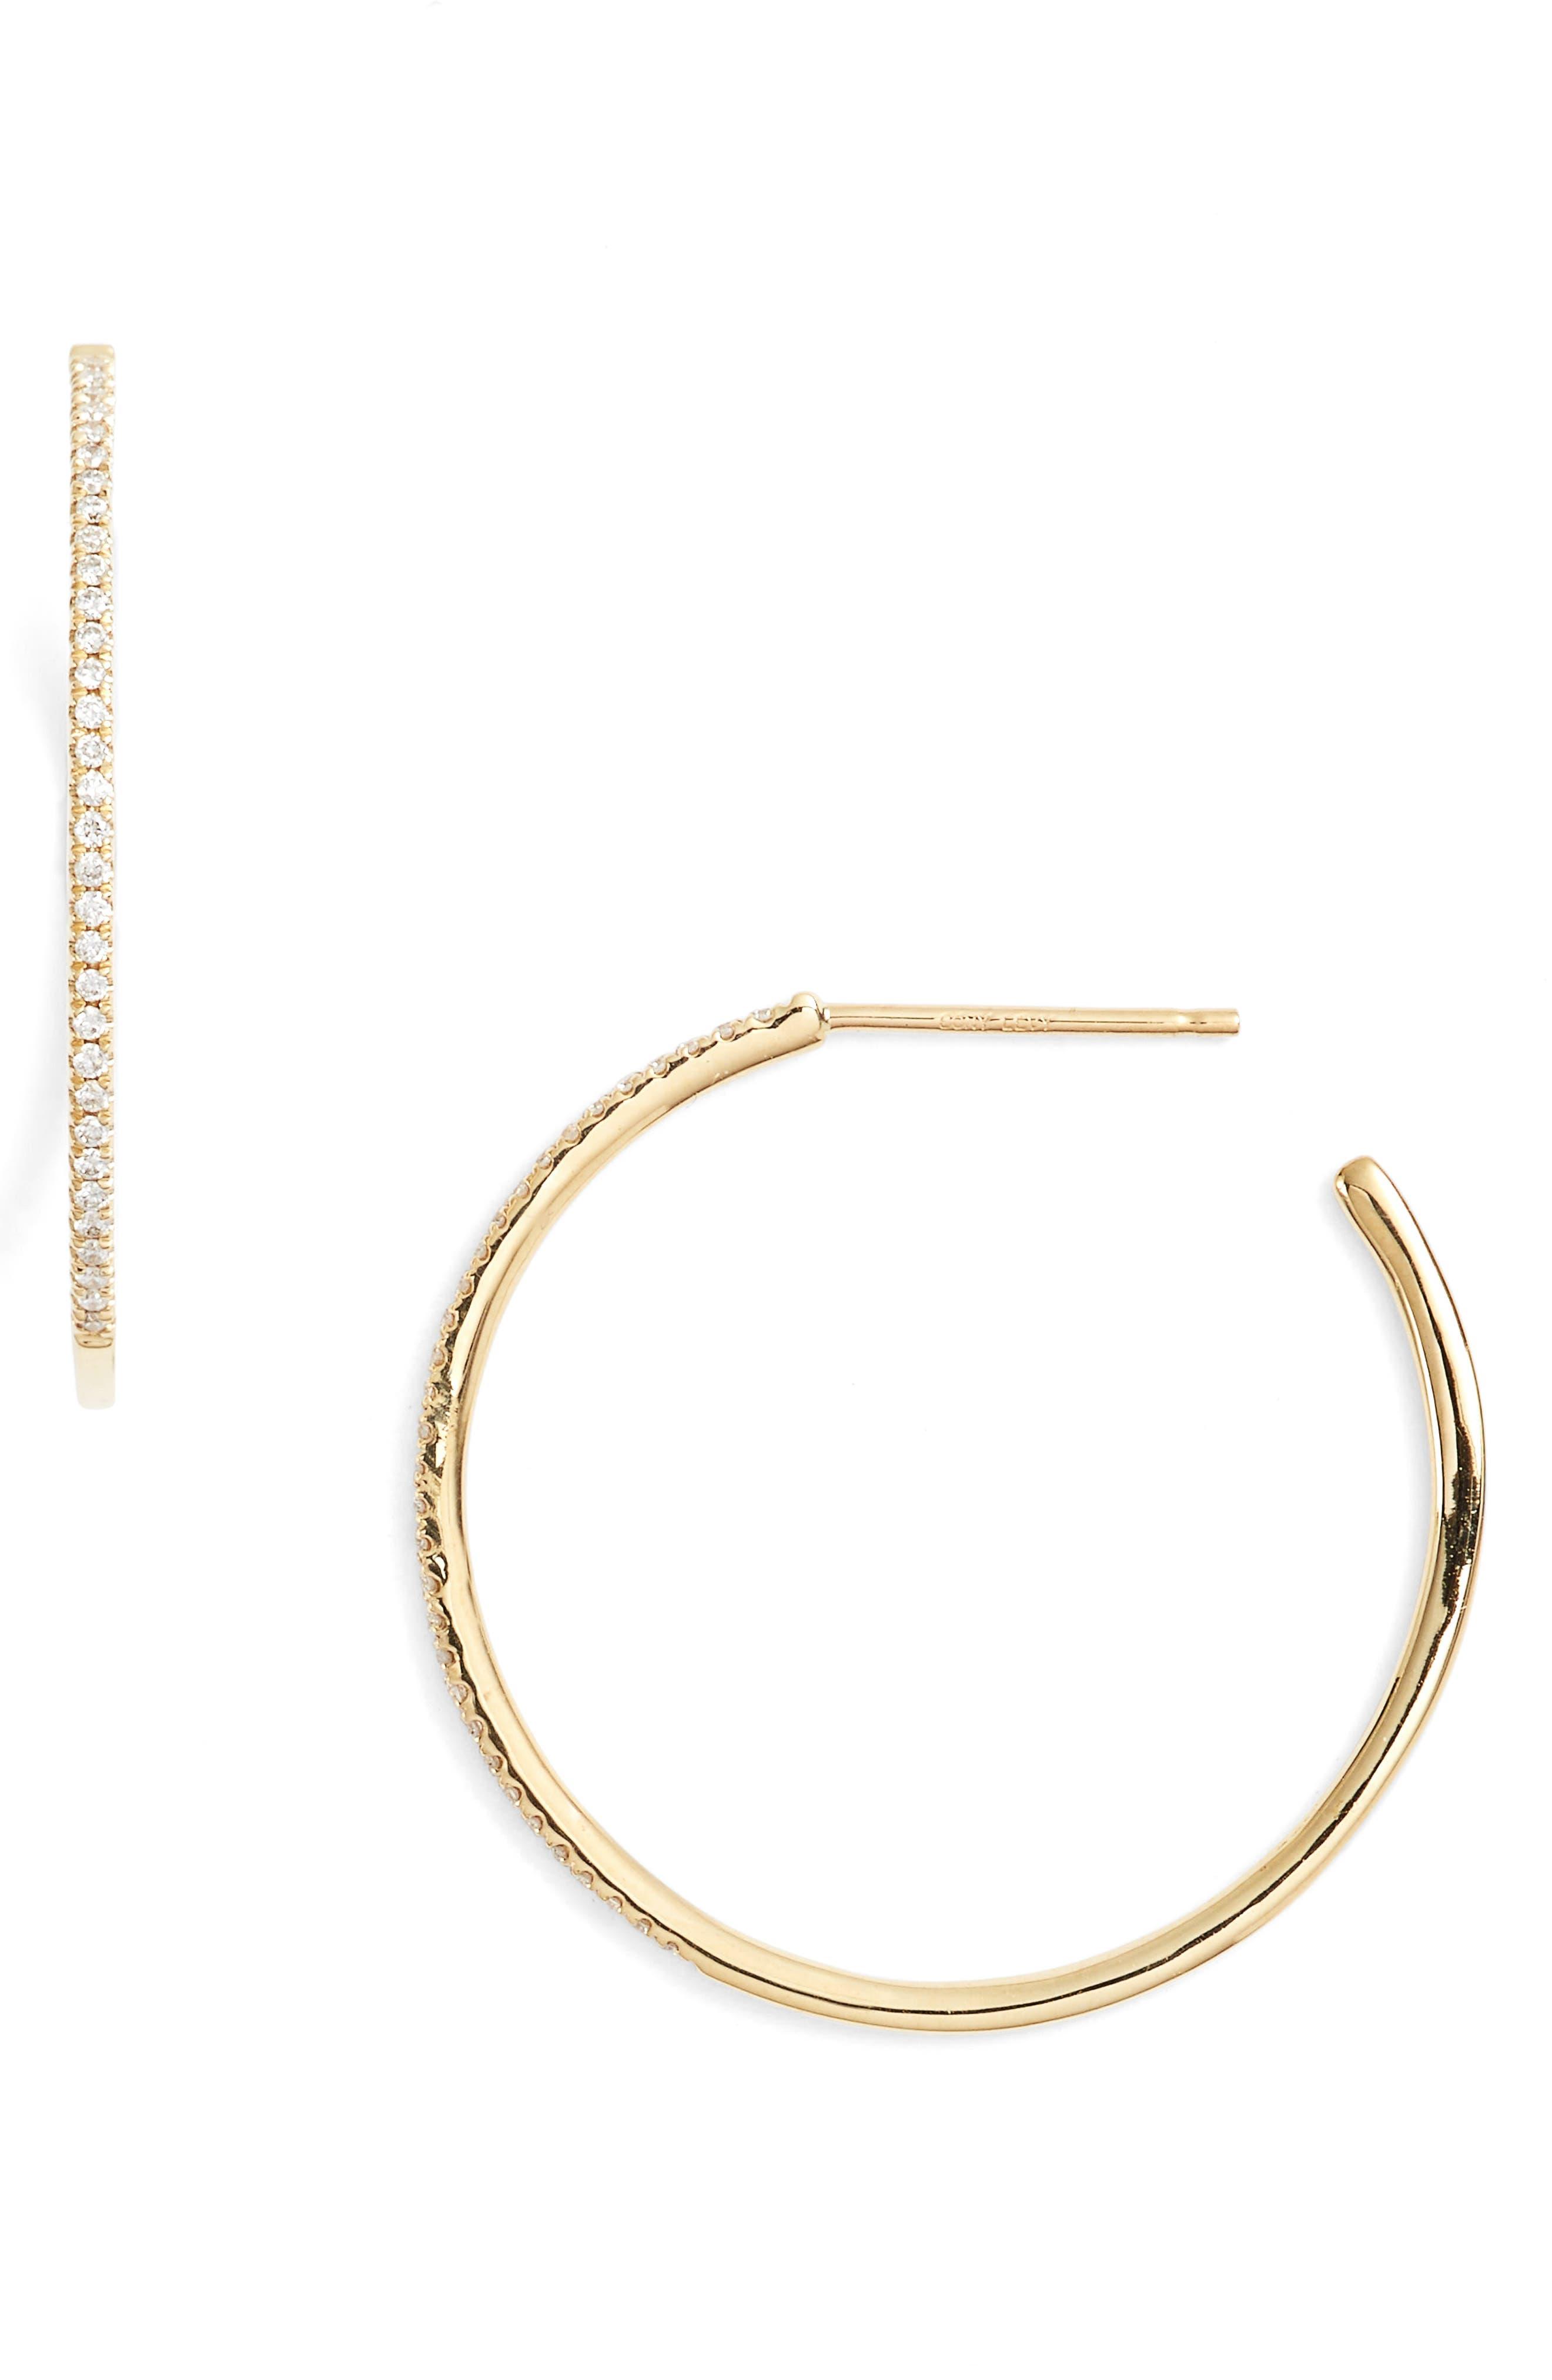 Ella Diamond Hoop Earrings,                         Main,                         color, YELLOW GOLD